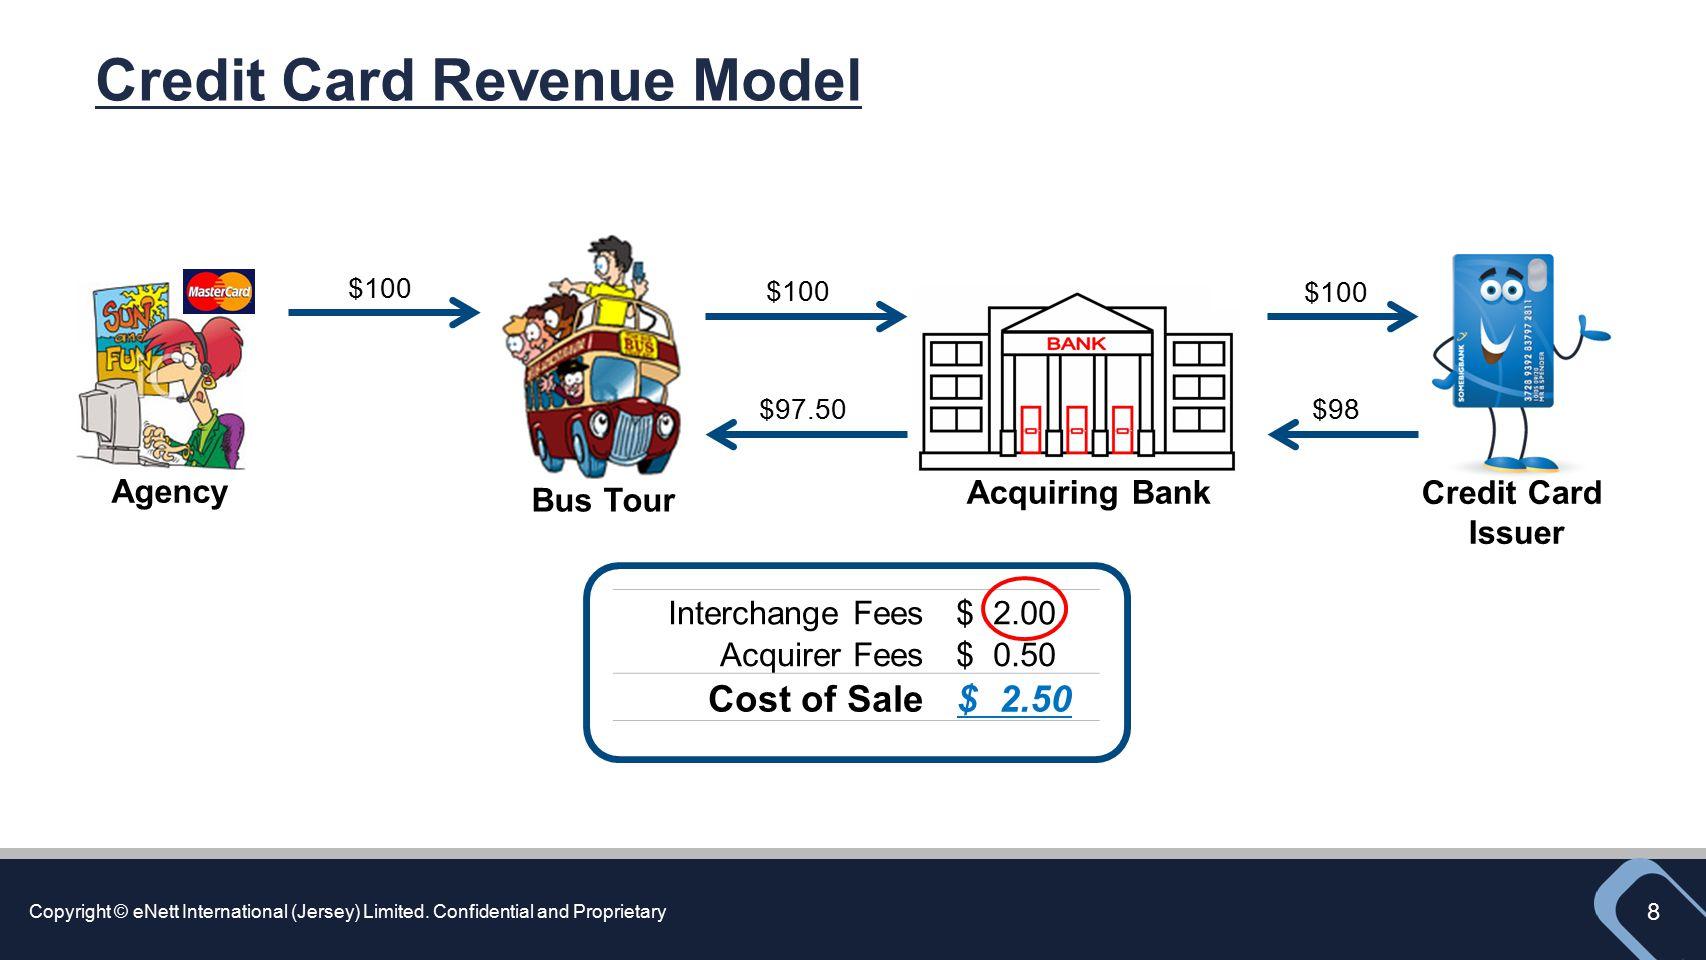 Credit Card Revenue Model